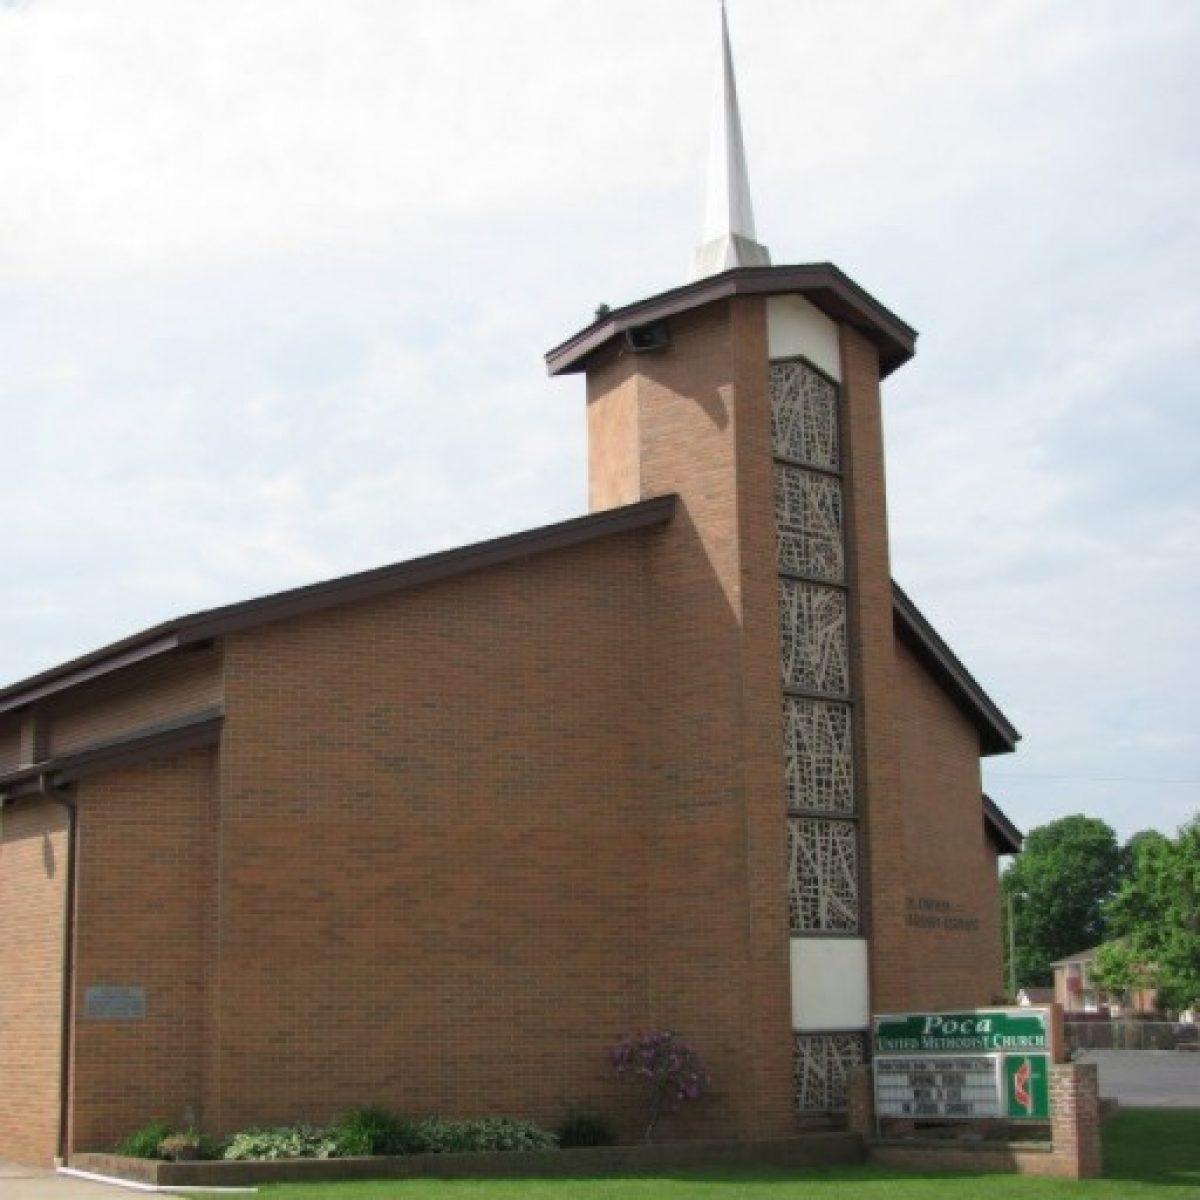 Poca United Methodist Church